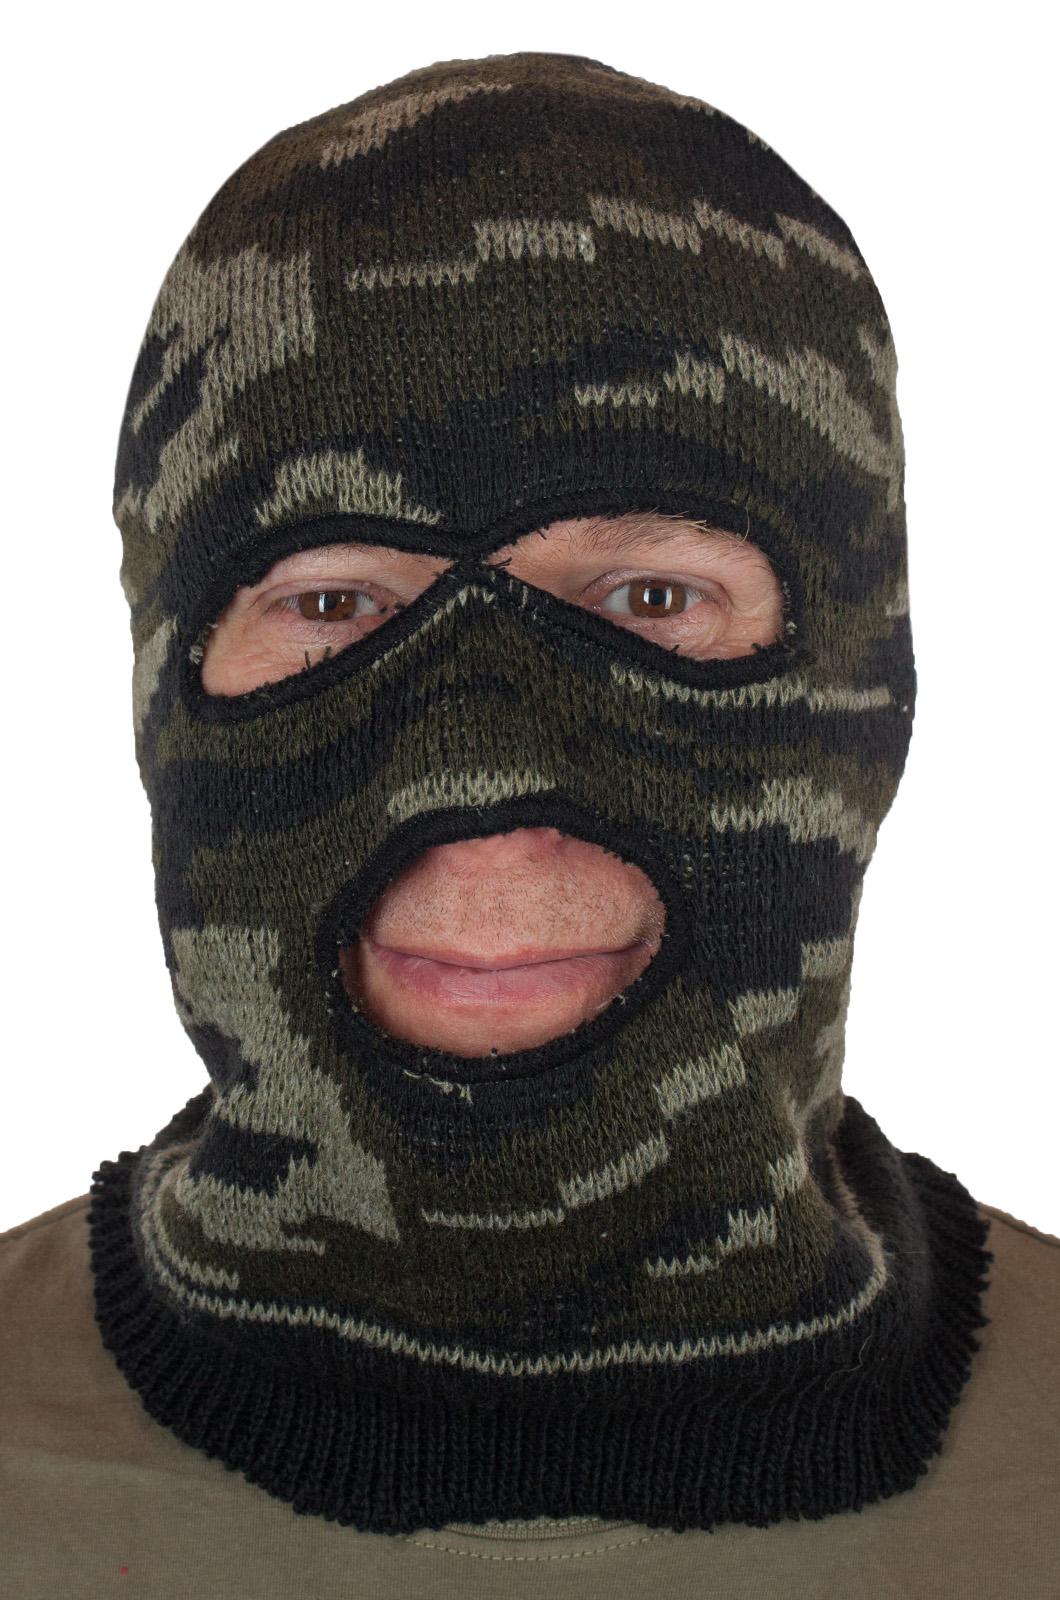 Армейская маска камуфляжная по лучшей цене